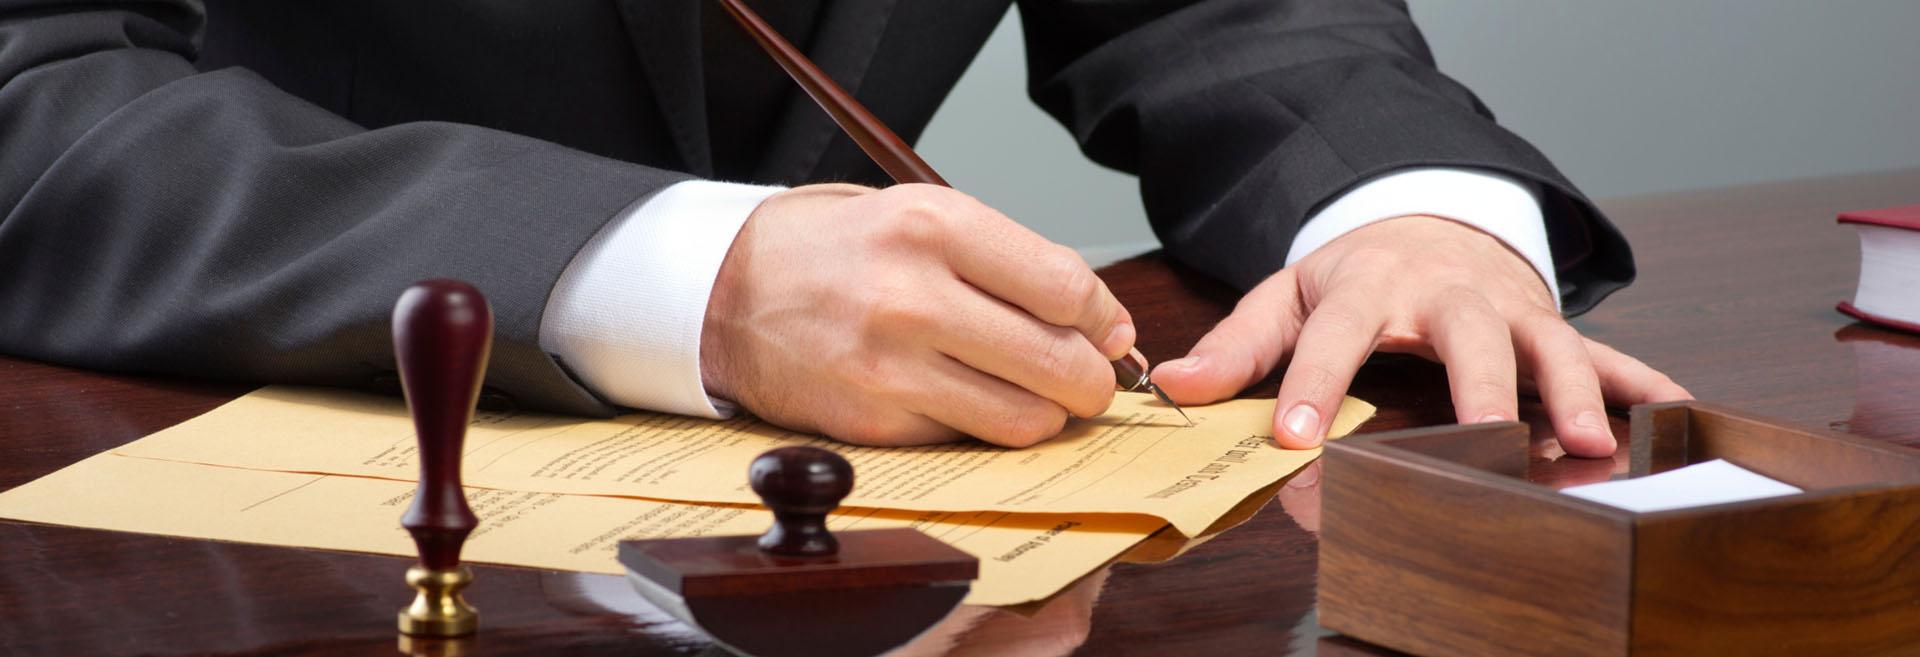 Professional law advice